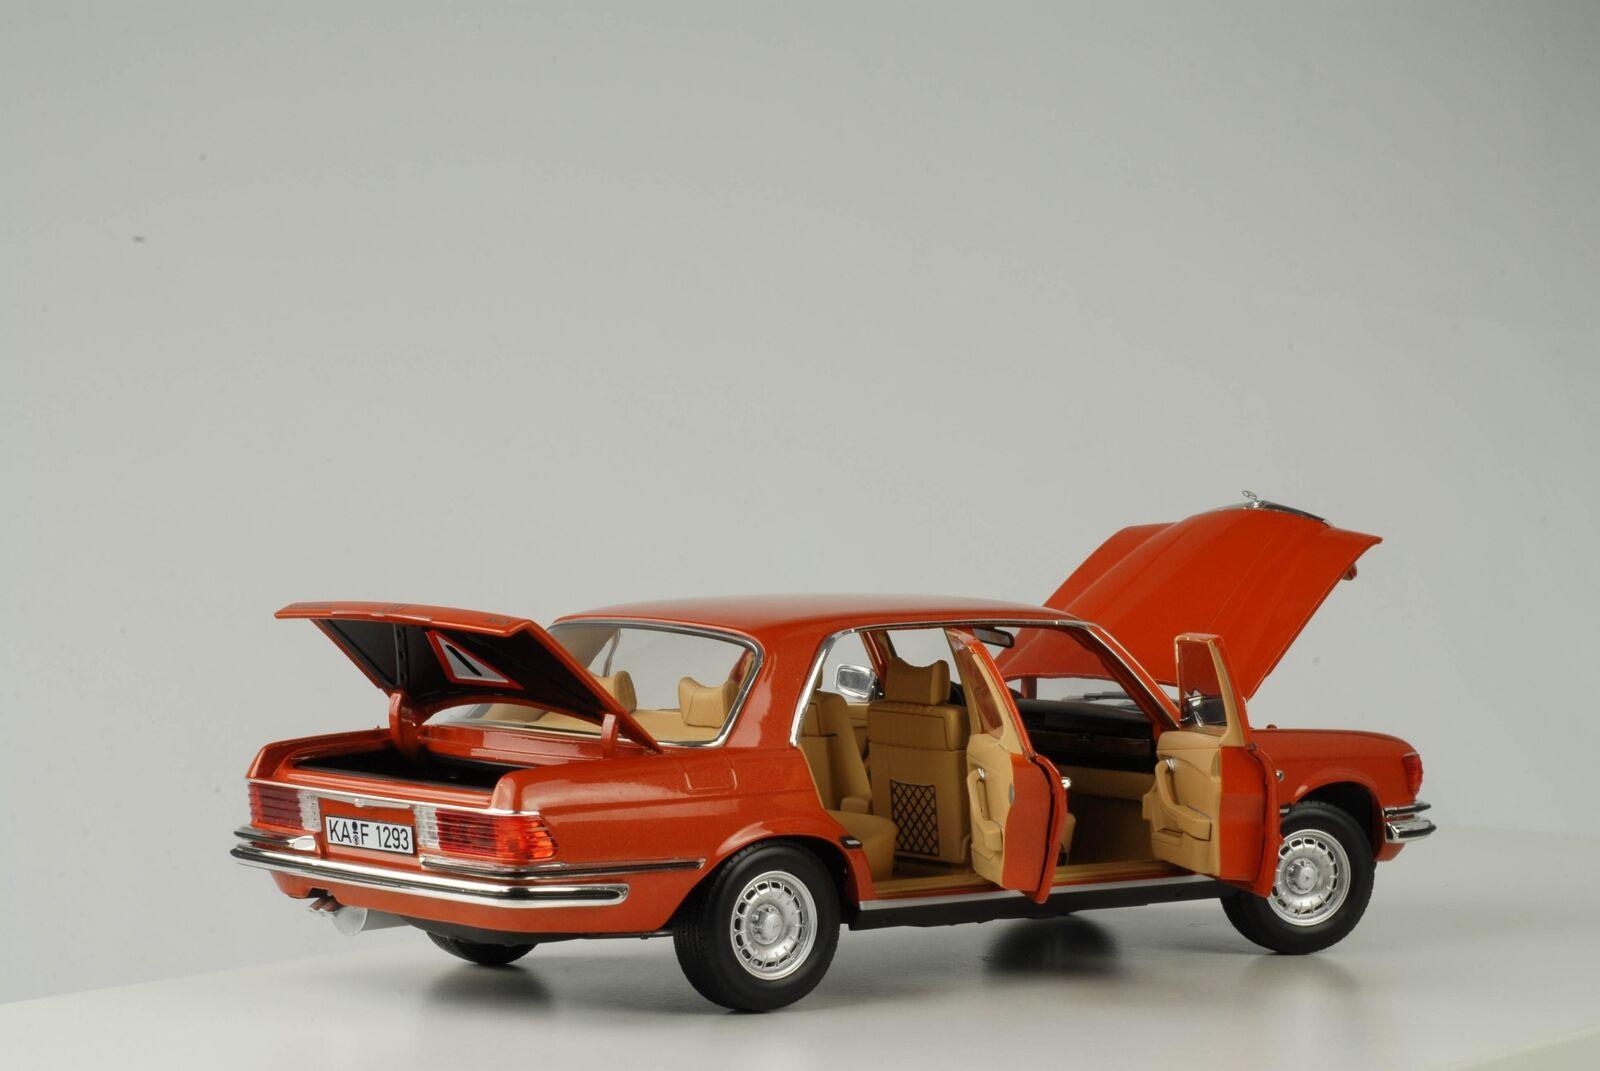 Mercedes-benz 1976 450 sel 6.9 w116 naranja metalizado 1 18 norev nuevo 183459